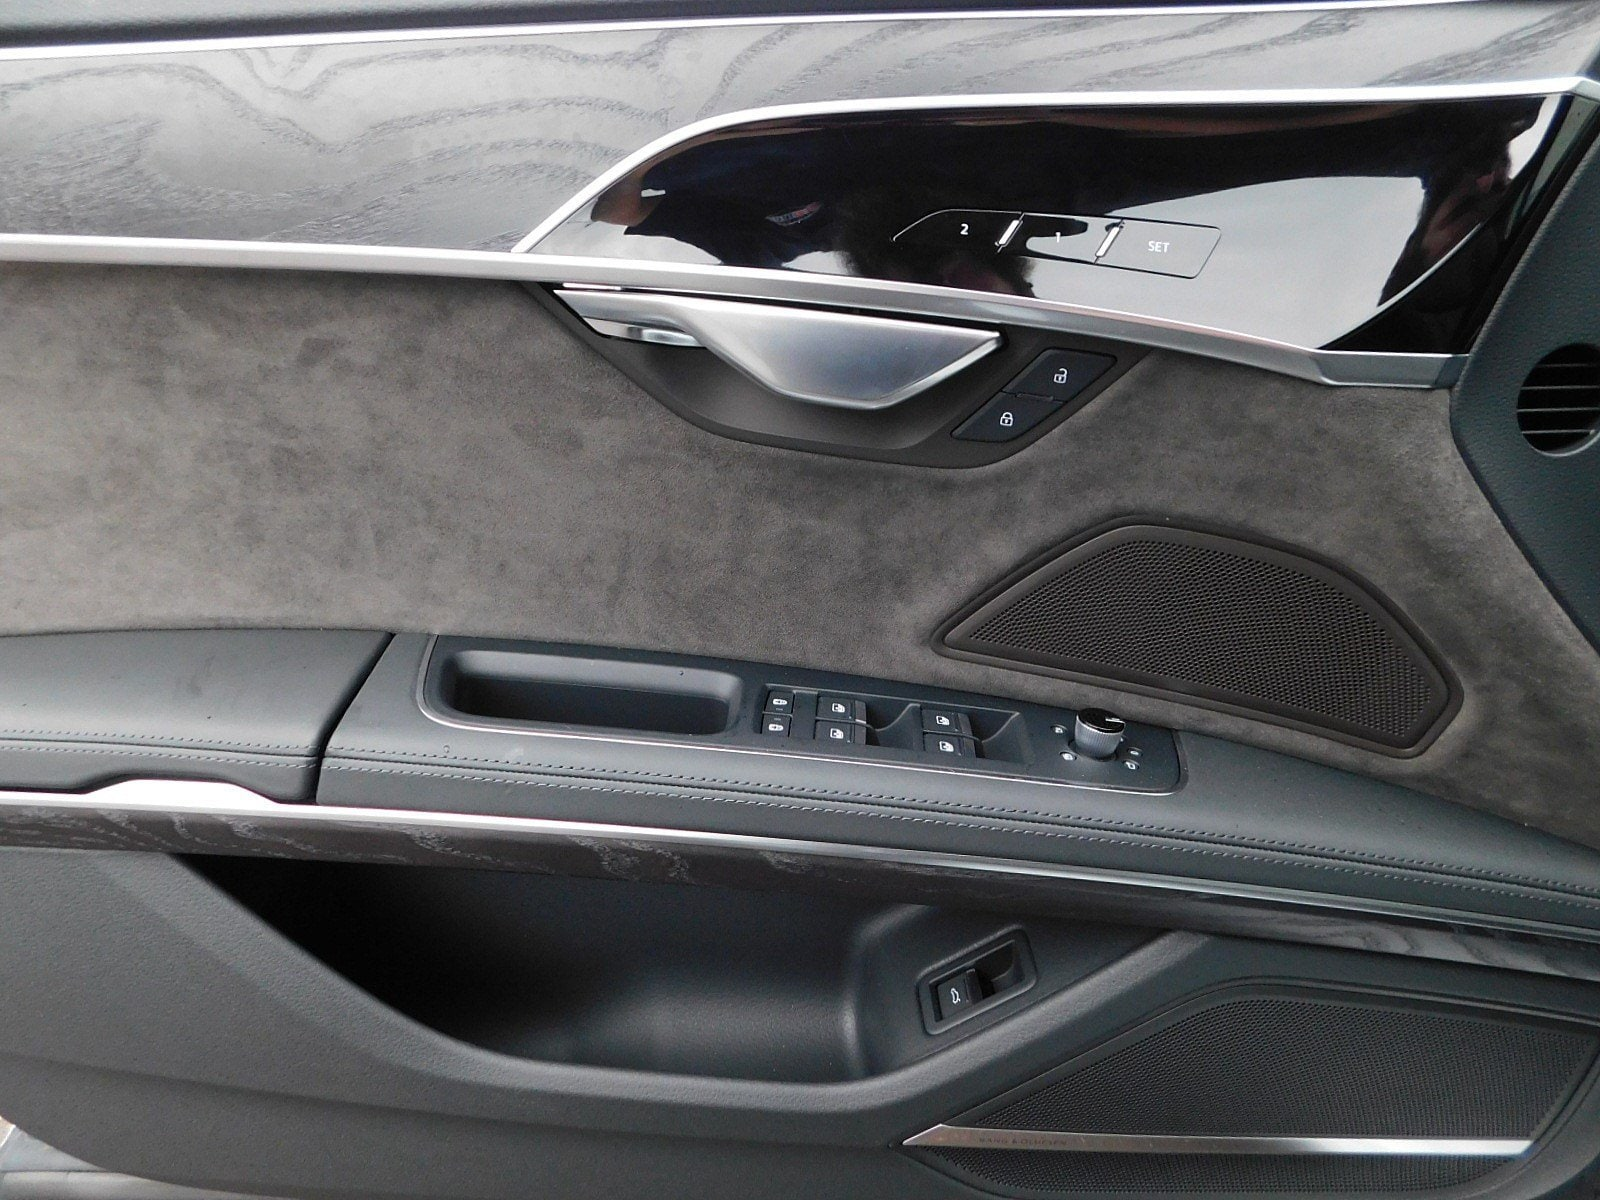 New 2019 Audi A8 For Sale at Audi Fort Washington | VIN